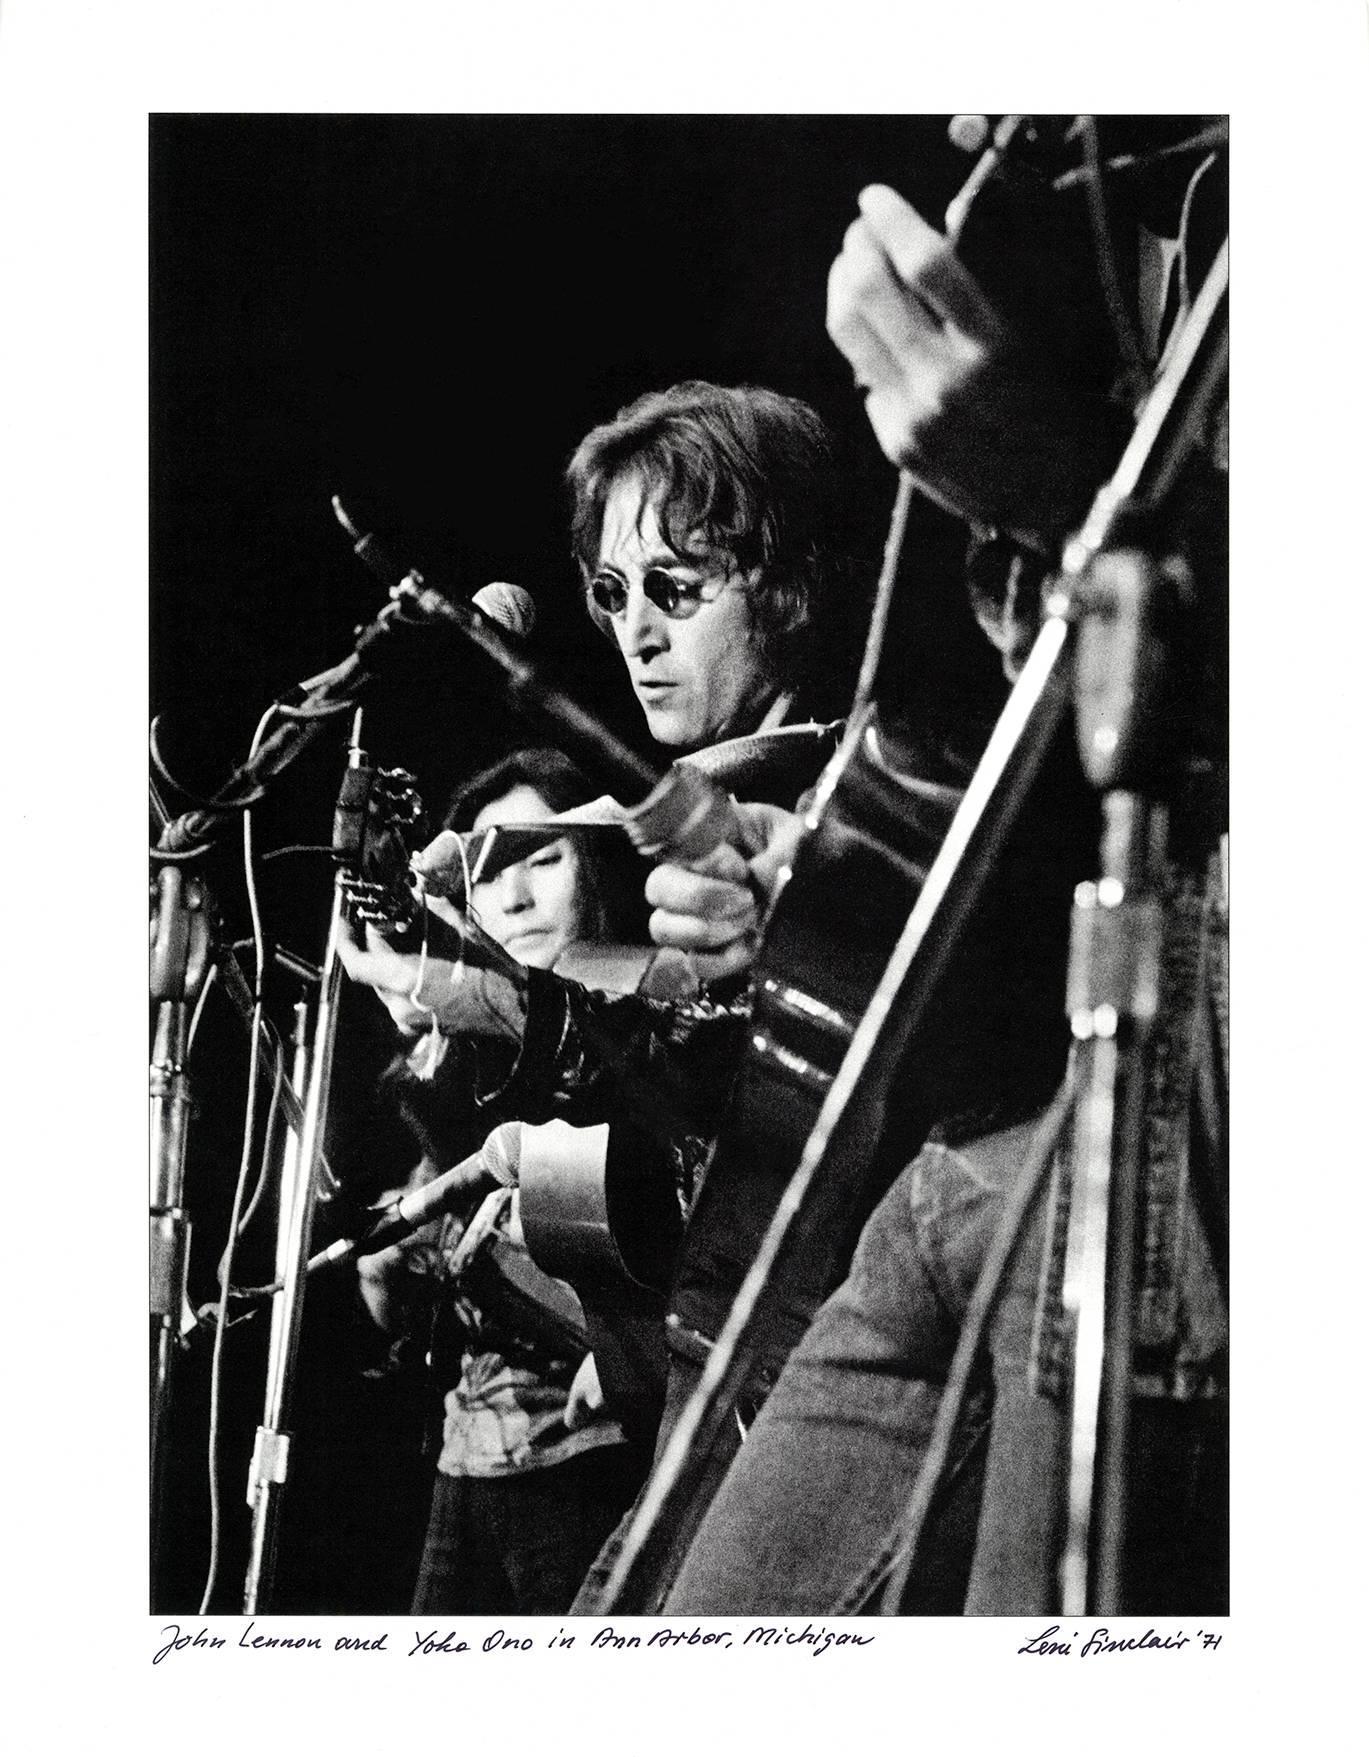 John Lennon photograph Detroit, 1971 (photo of John Lennon)